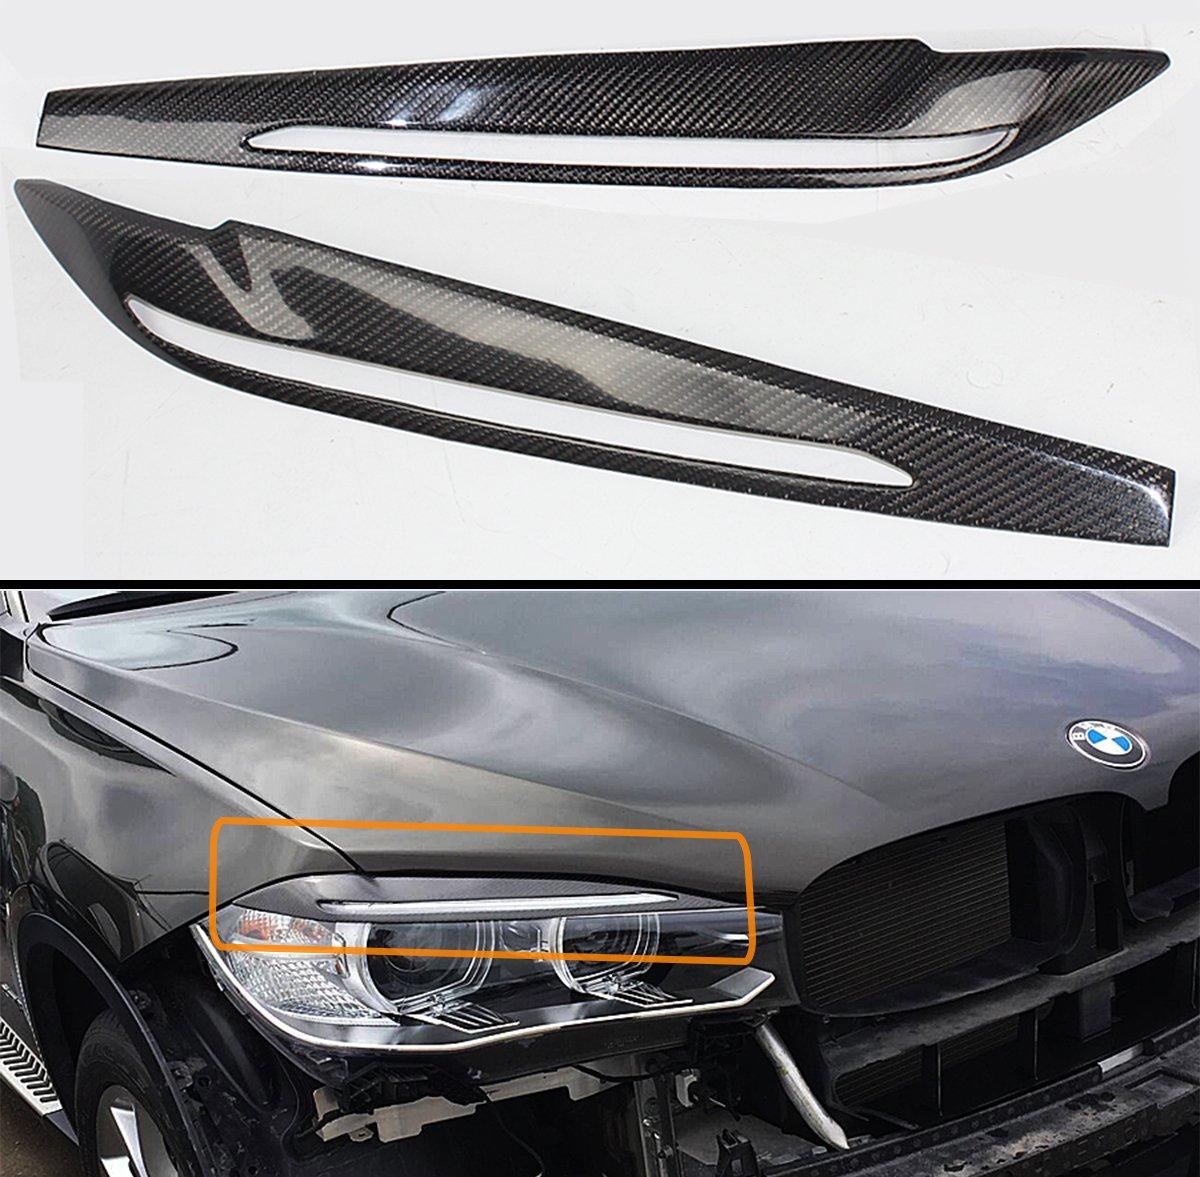 Cuztom Tuning for 2015-2018 BMW F15 X5 F85 X5M F16 F86 X6 X6M Carbon Fiber Headlight Eye LID Cover Pair Eyebrow